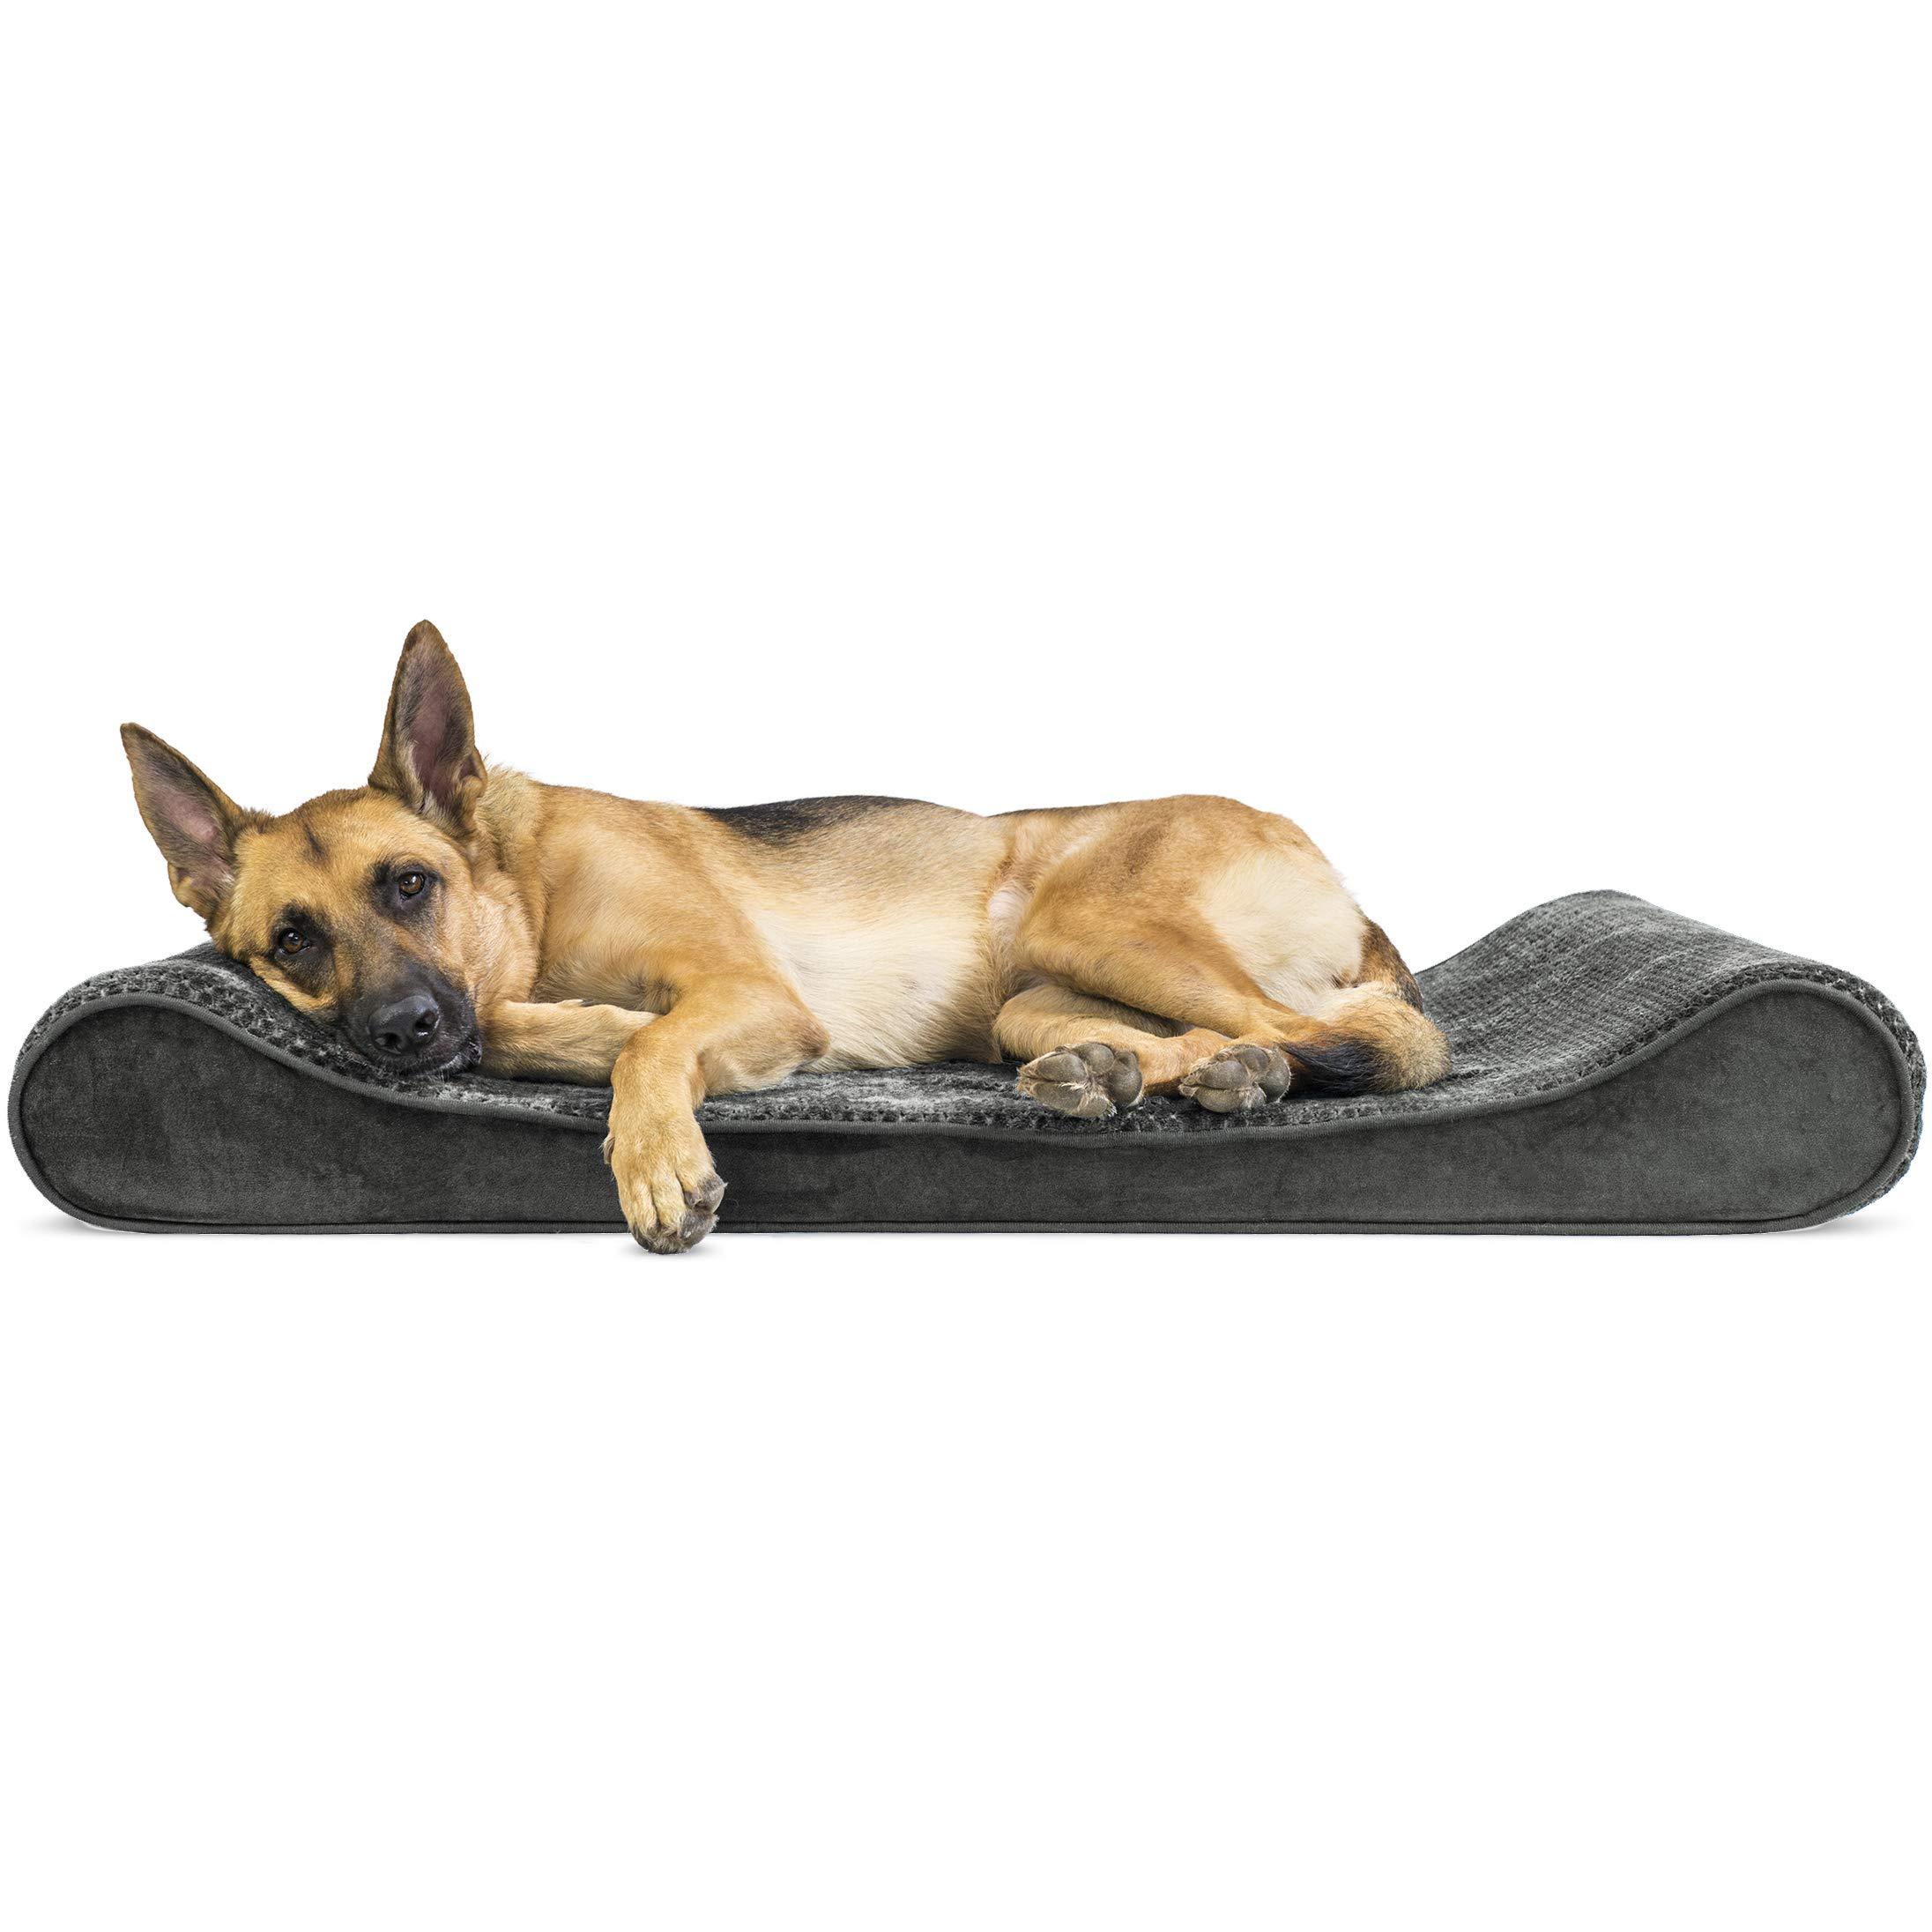 Furhaven Pet Dog Bed | Orthopedic Minky Plush & Velvet Ergonomic Luxe Lounger Cradle Mattress Contour Pet Bed for Dogs & Cats, Gray, Jumbo